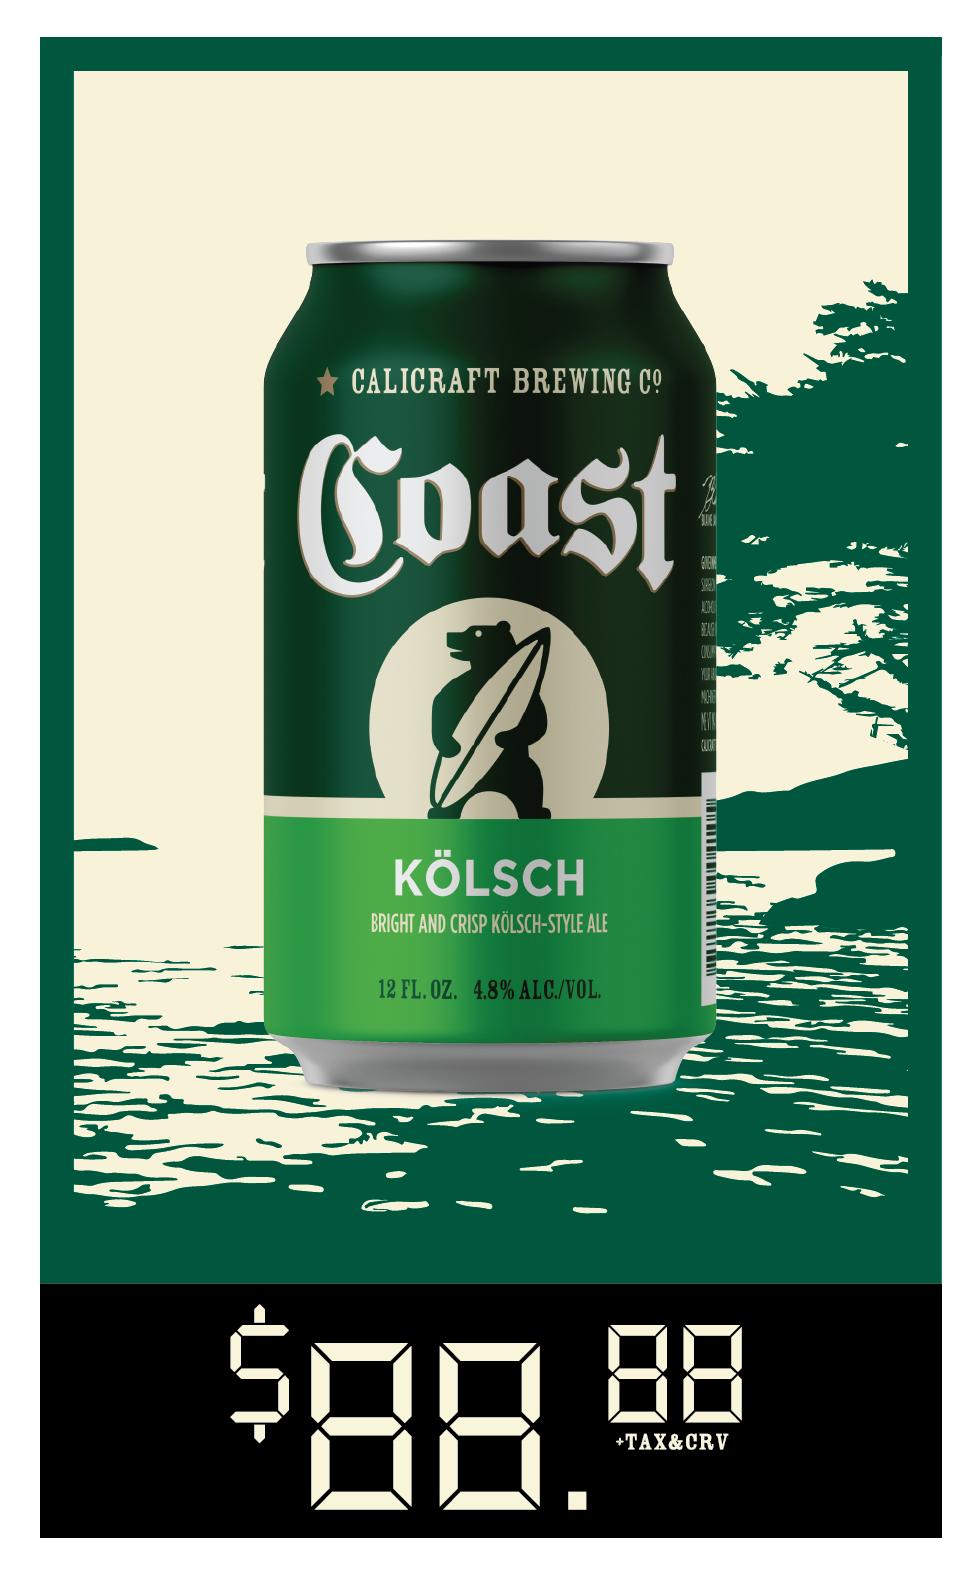 Coast_3x5-01.png